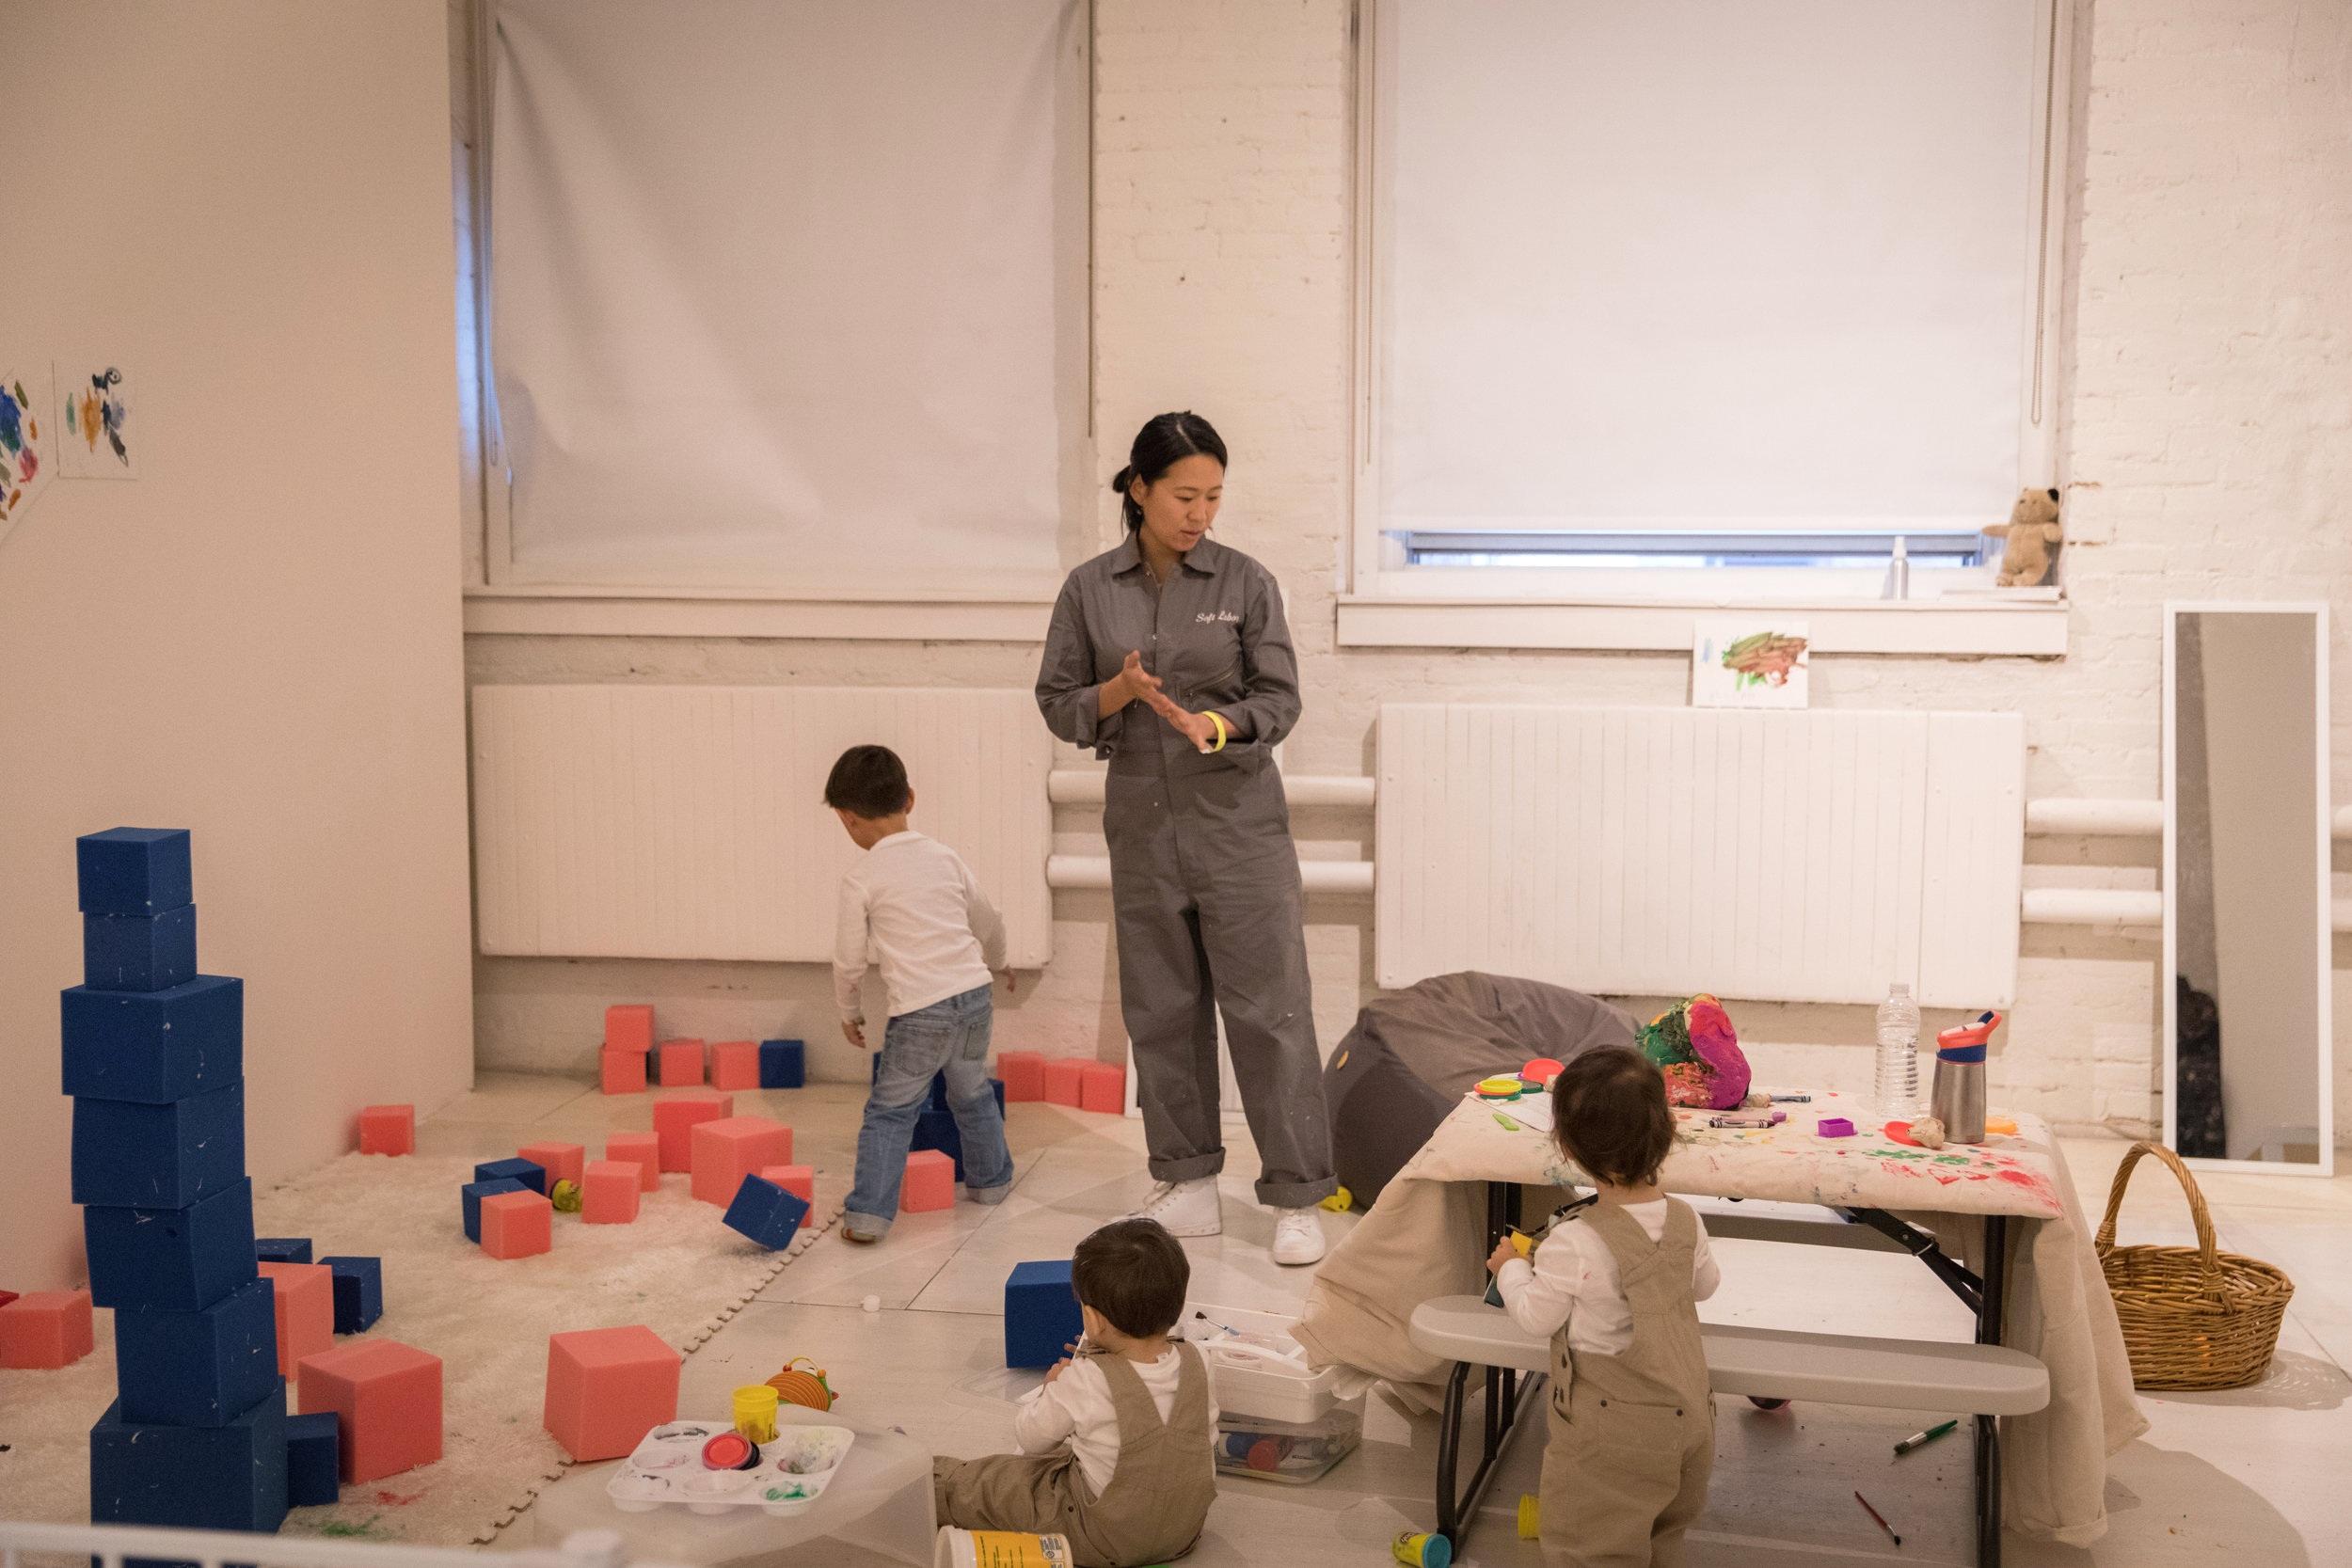 MoMA PS1, Image courtesy of Walter Wlodarczyk